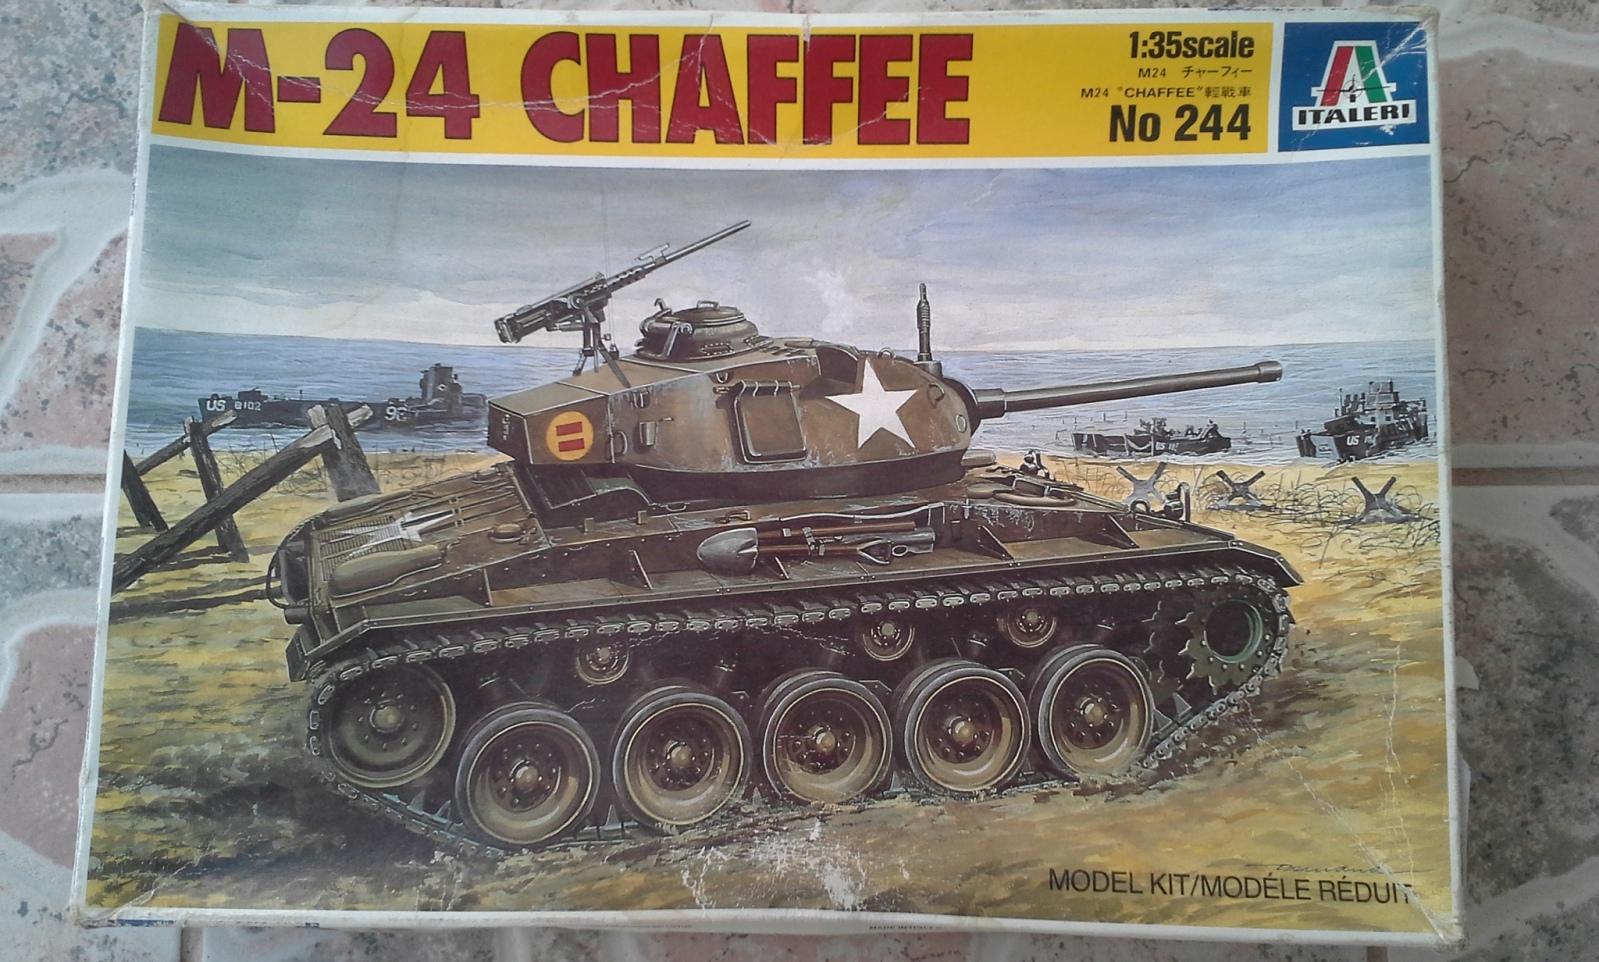 M-24 Chaffee, Ελληνικός Στρατός 258b0gl